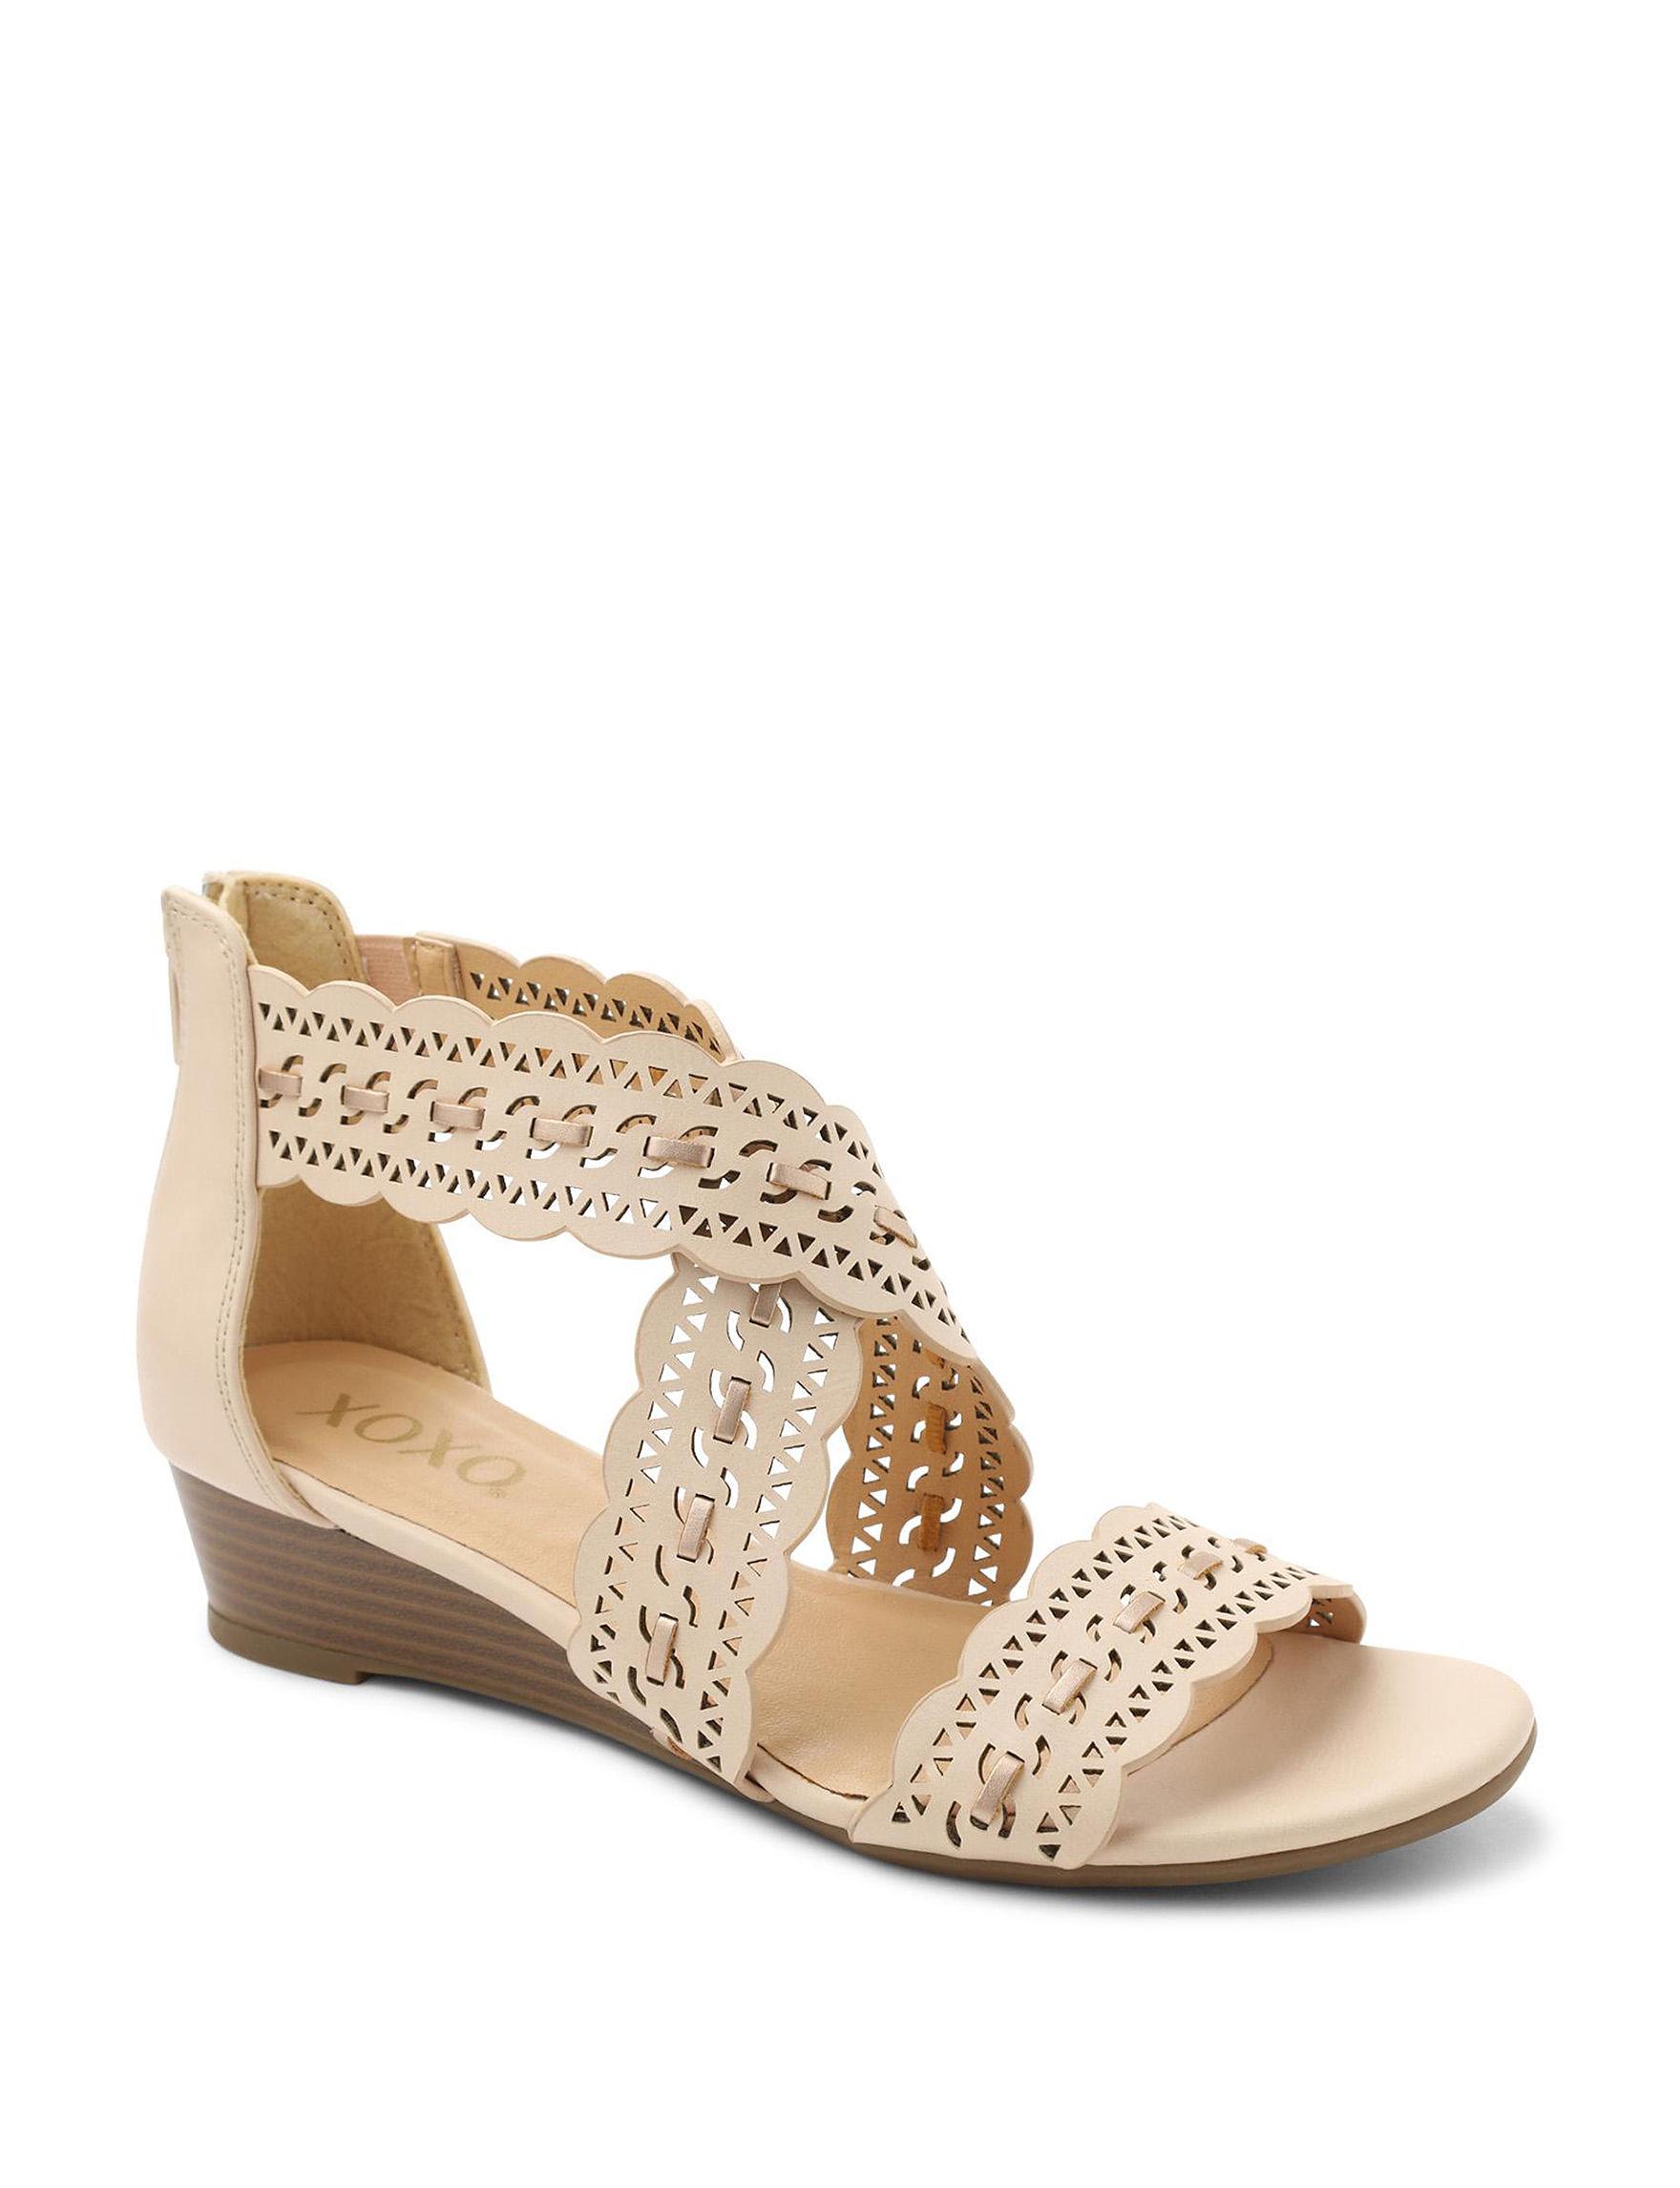 XOXO Beige Wedge Sandals